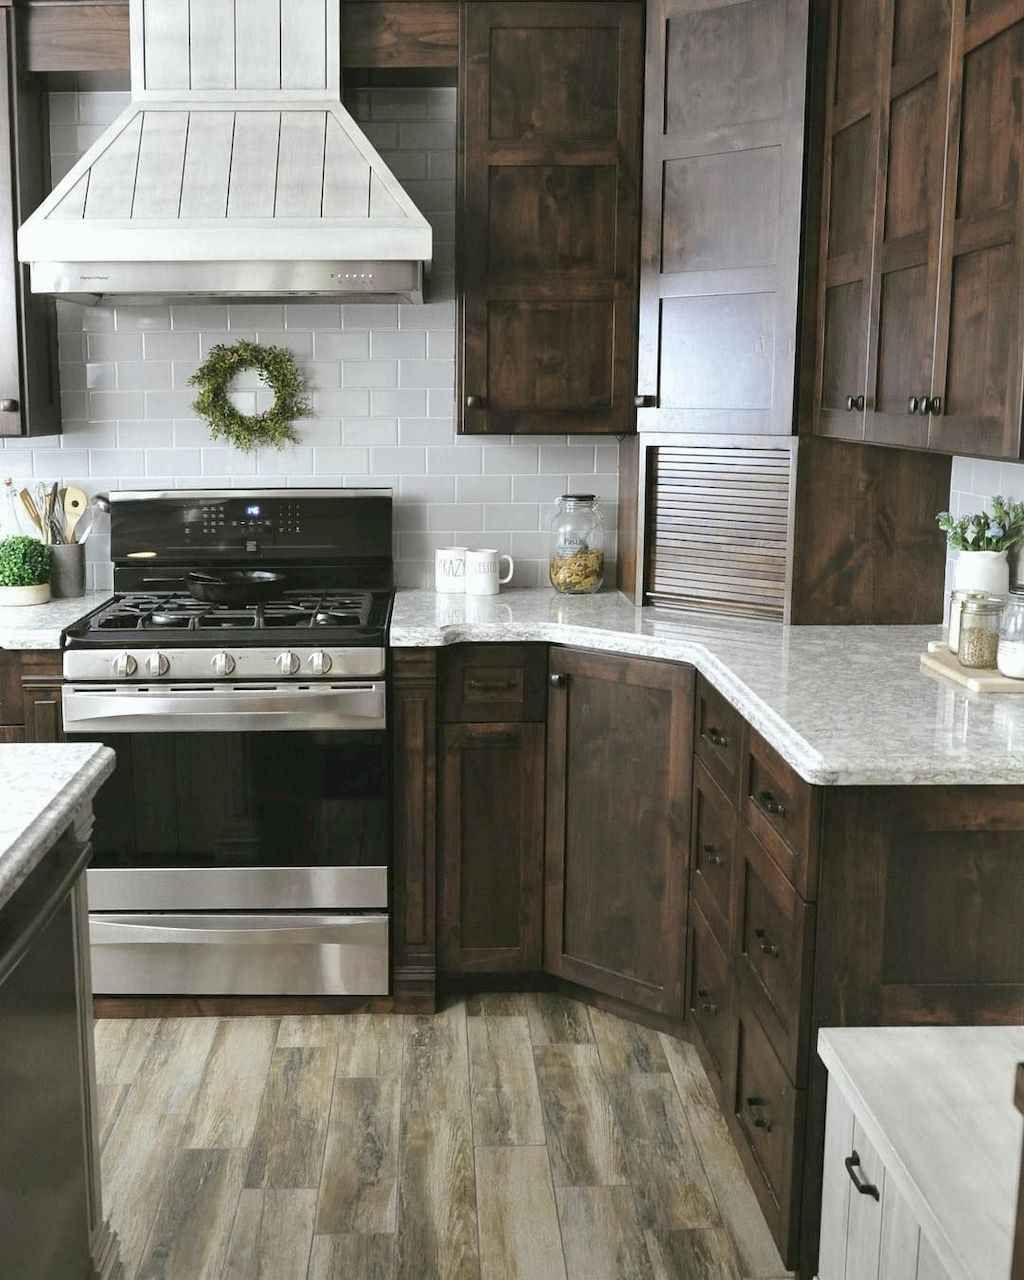 40 Brilliant Kitchen Cabinet Organization and Tips Ideas ...